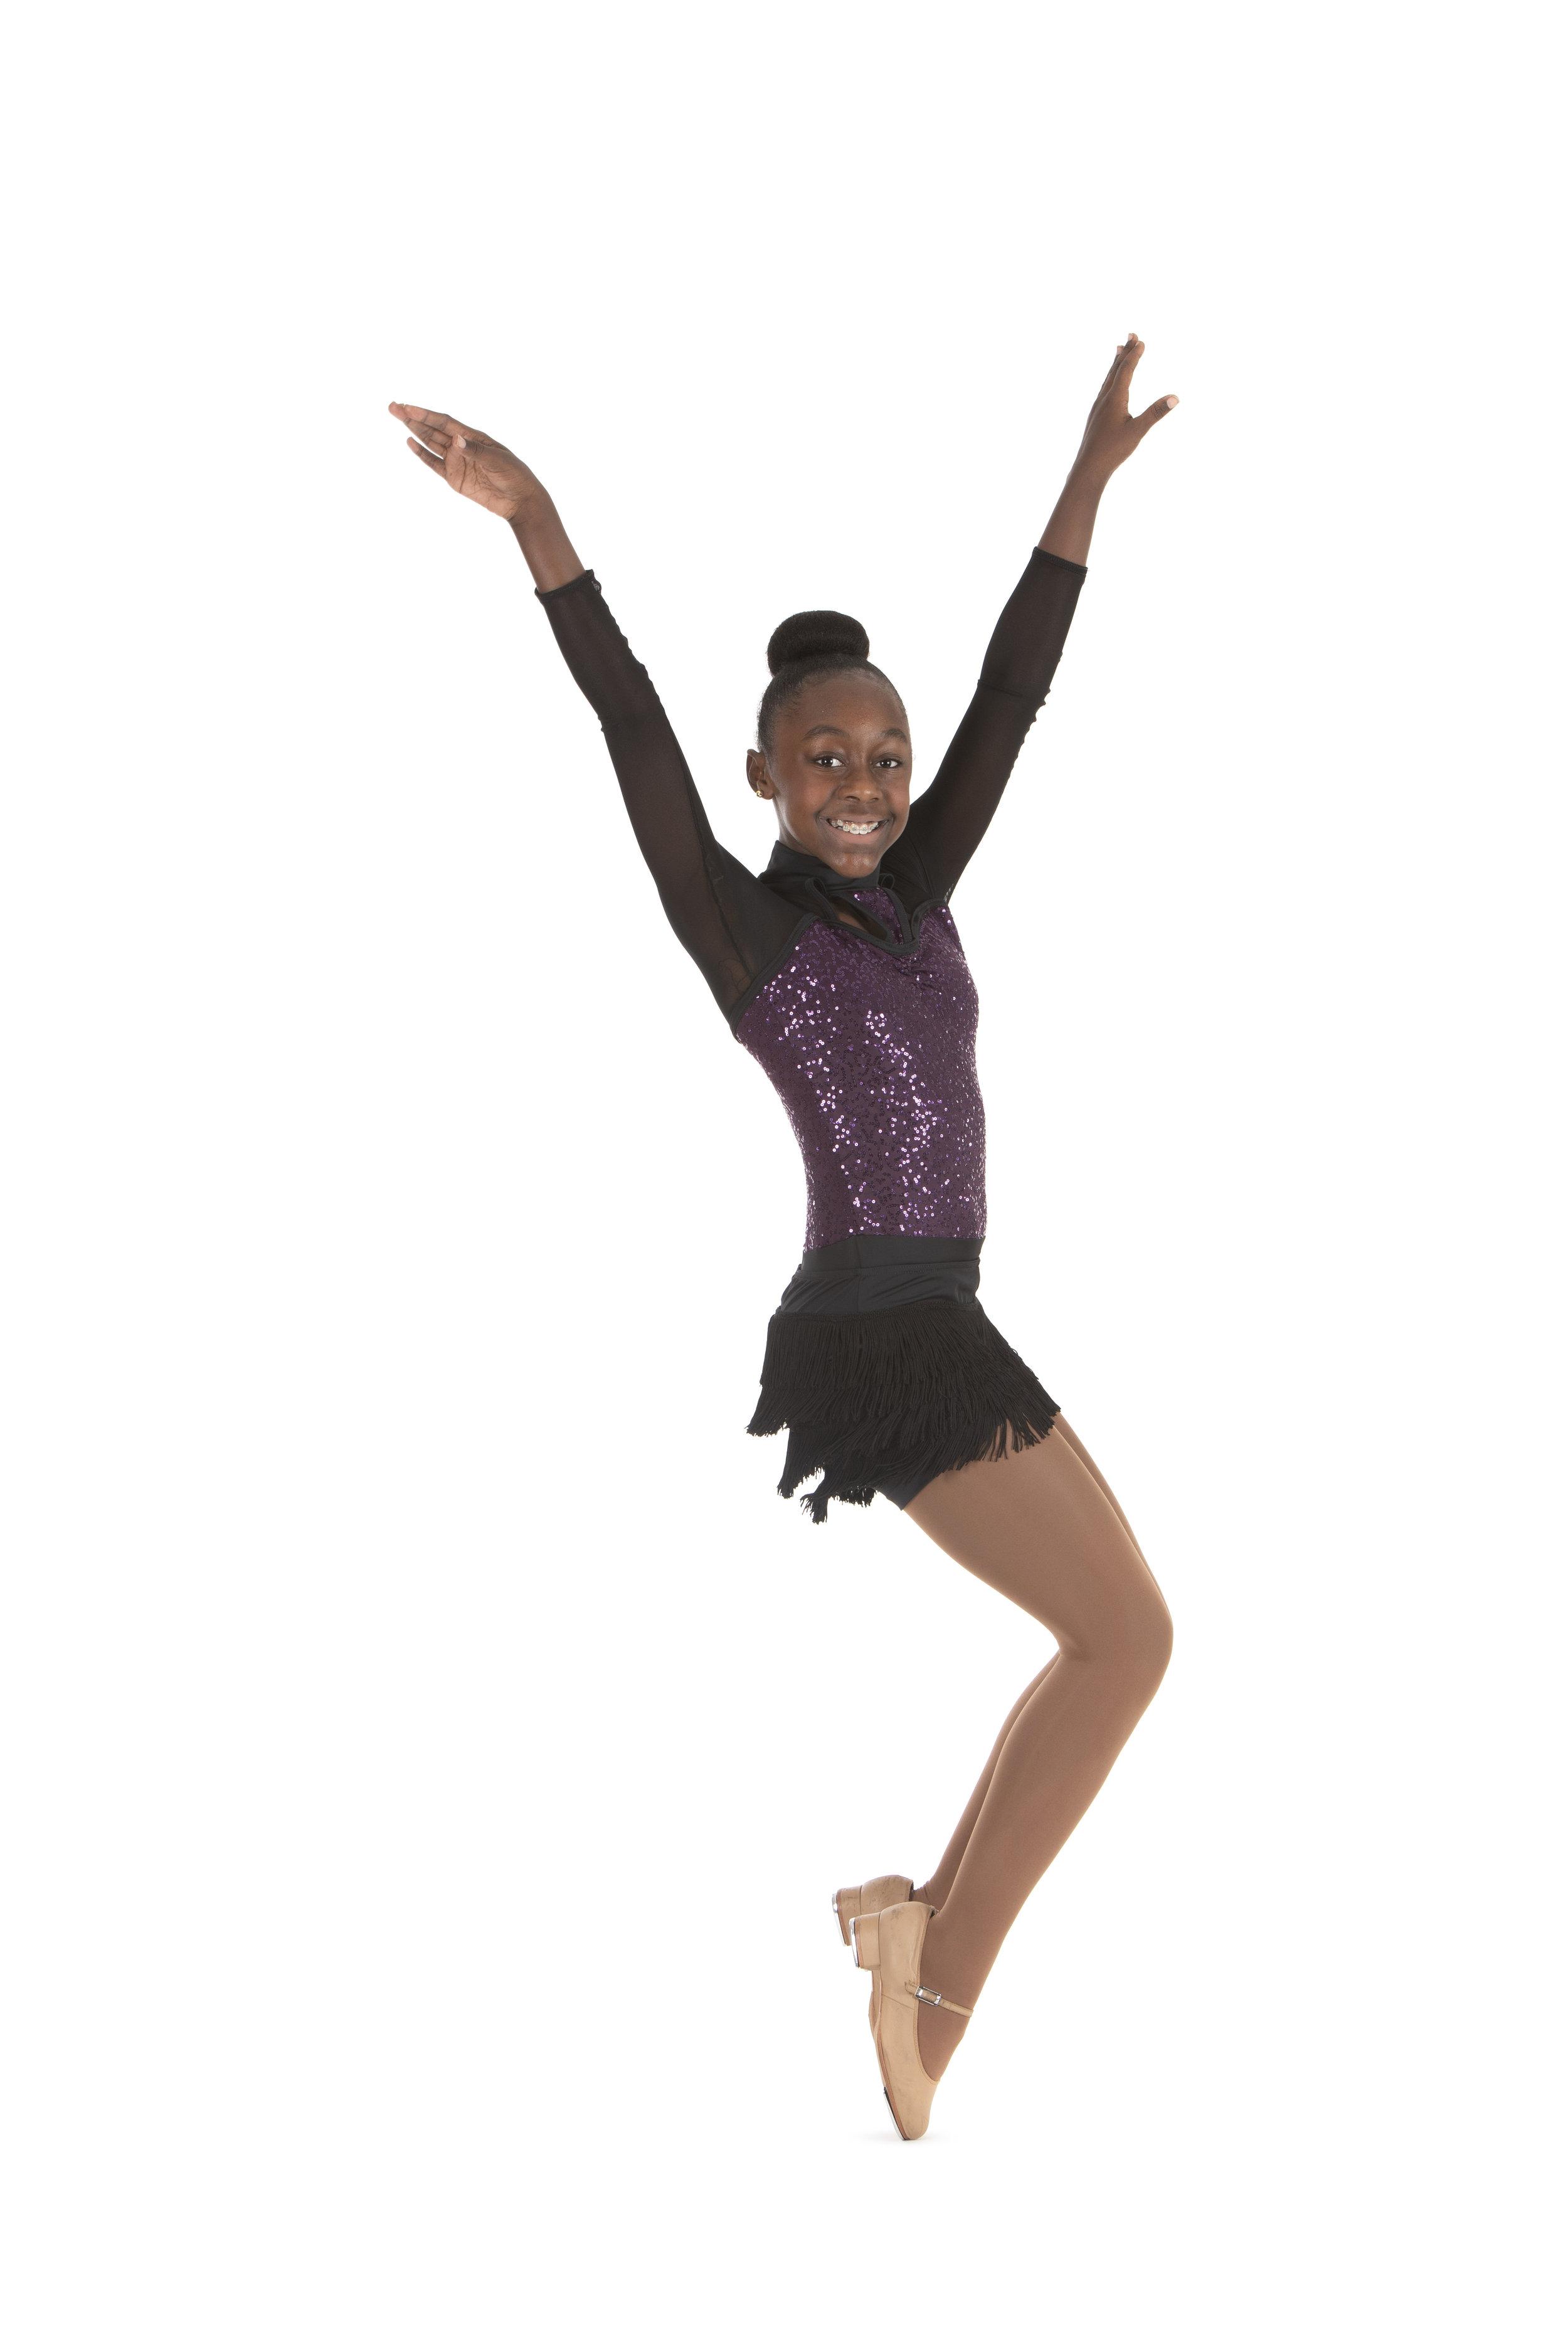 dance: Rise up Choreotrapher: Persephonia Wilson Style: Acro Photo Credit: Bob Metelus Photo studio